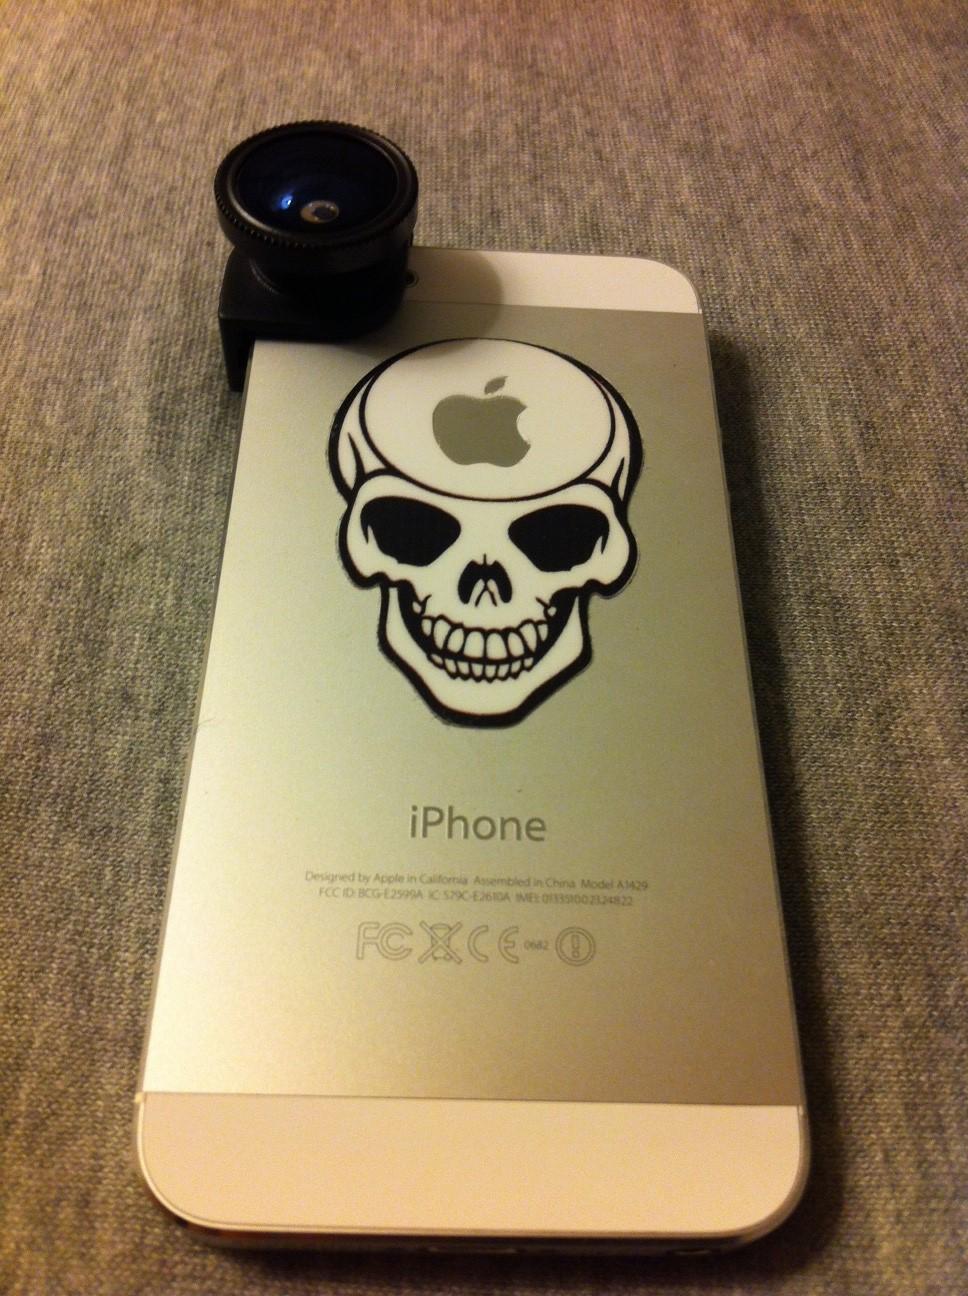 kit objectif iphone 5 arriere - Test : Kit objectif photo 3 en 1 pour iPhone 5